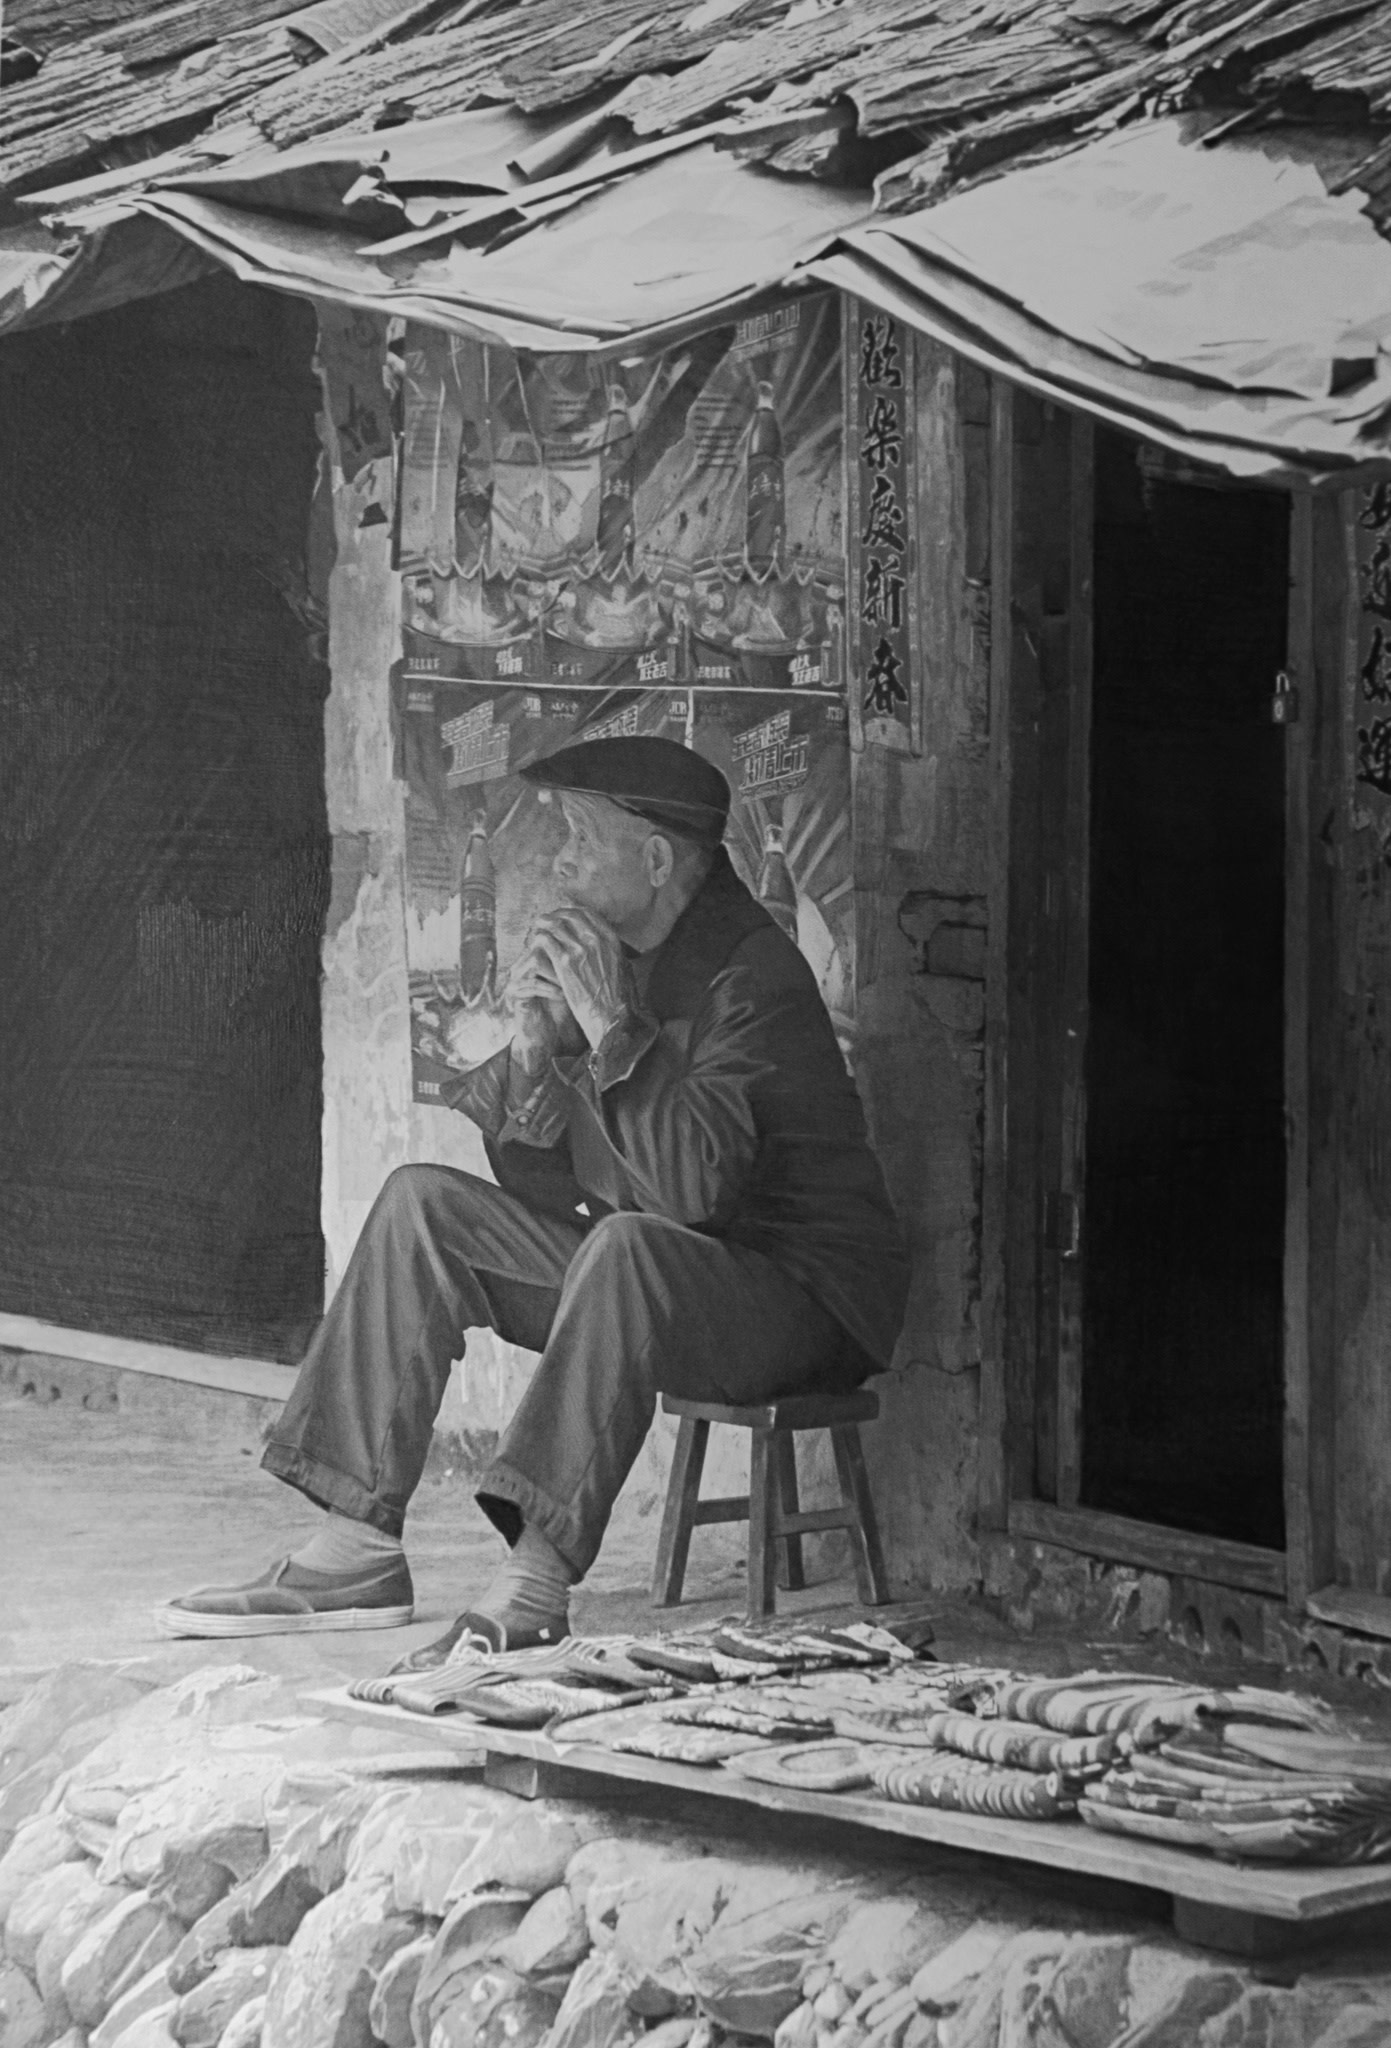 <span class=&#34;link fancybox-details-link&#34;><a href=&#34;/artists/77-paul-cadden/works/1928/&#34;>View Detail Page</a></span><div class=&#34;artist&#34;><strong>Paul Cadden</strong></div> <div class=&#34;title&#34;><em>The Breaking Hands</em></div> <div class=&#34;medium&#34;>pencil on paper</div> <div class=&#34;dimensions&#34;>70 x 47 cm</div>